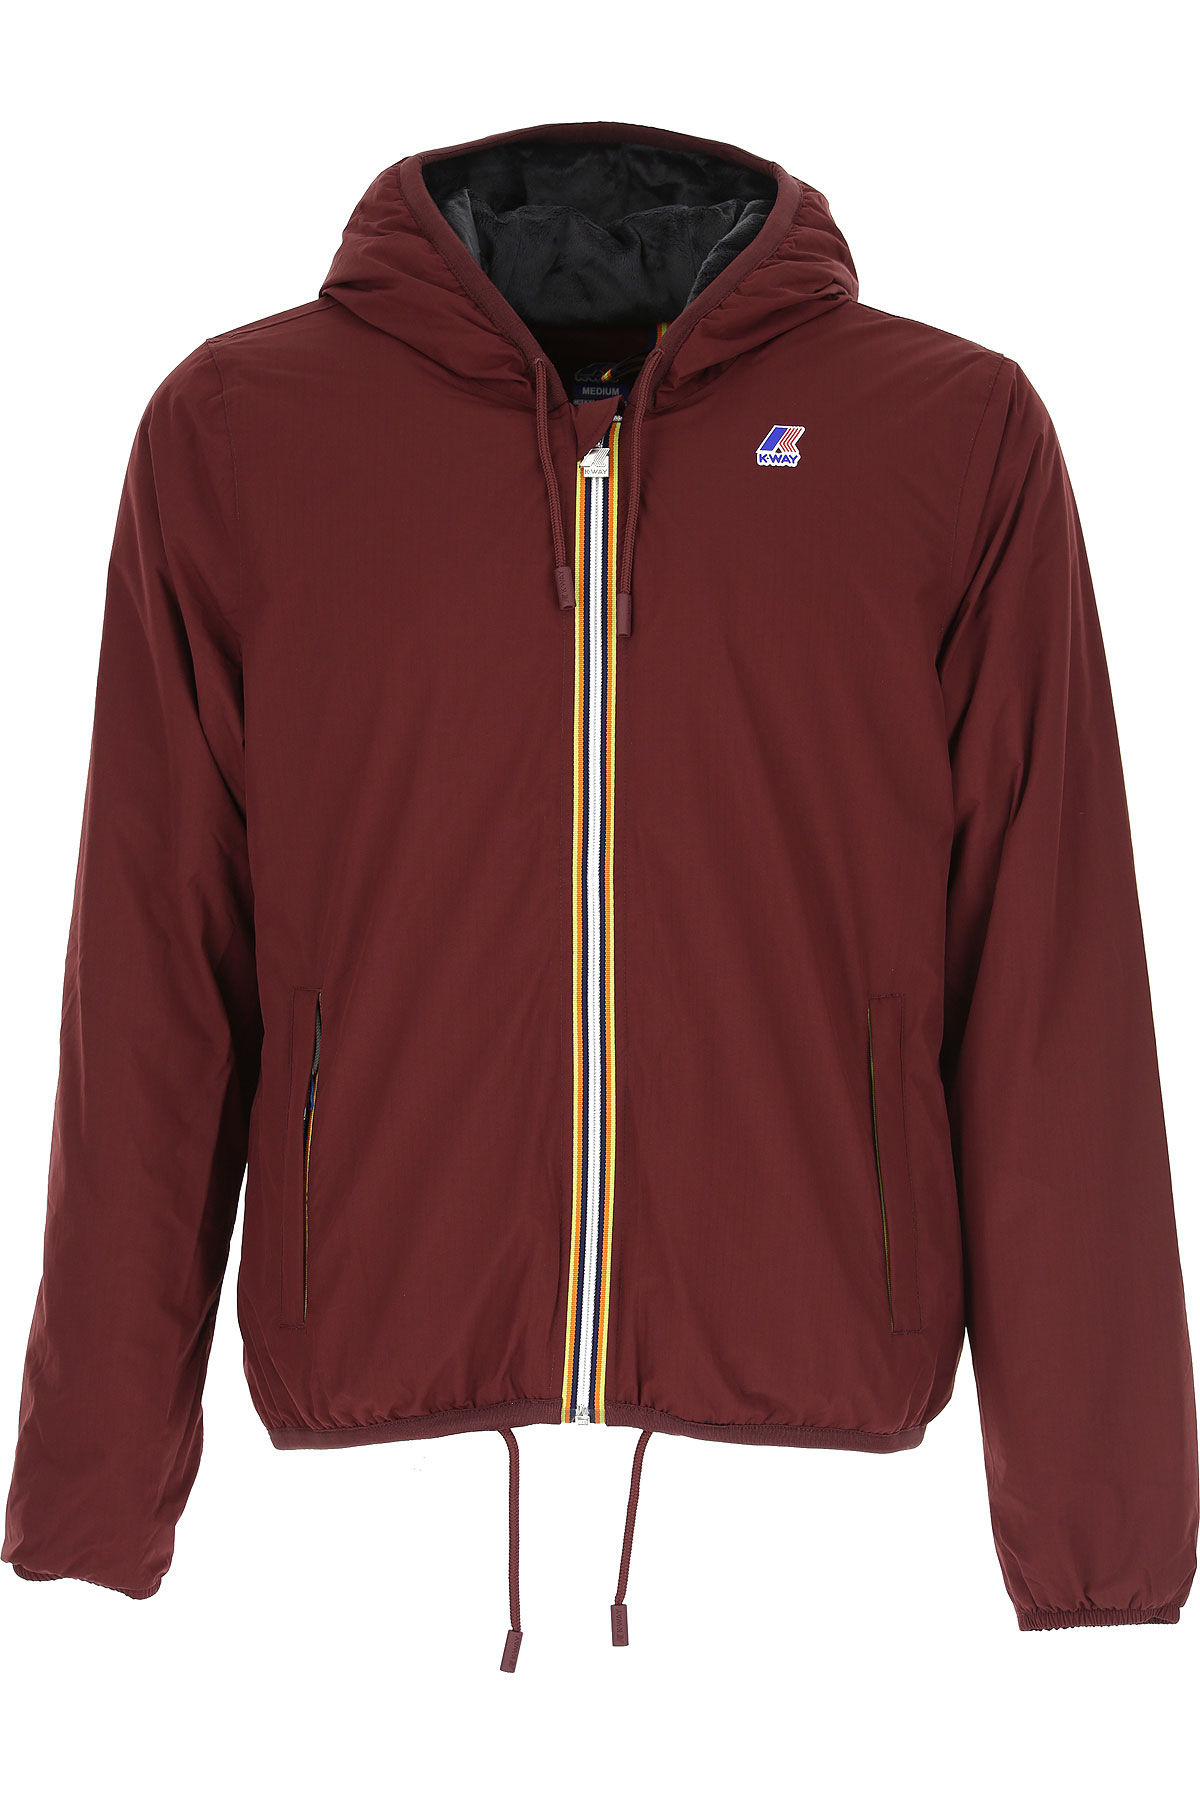 K-Way Down Jacket for Men, Puffer Ski Jacket, Red Dahlia, polyester, 2019, L M S XXL